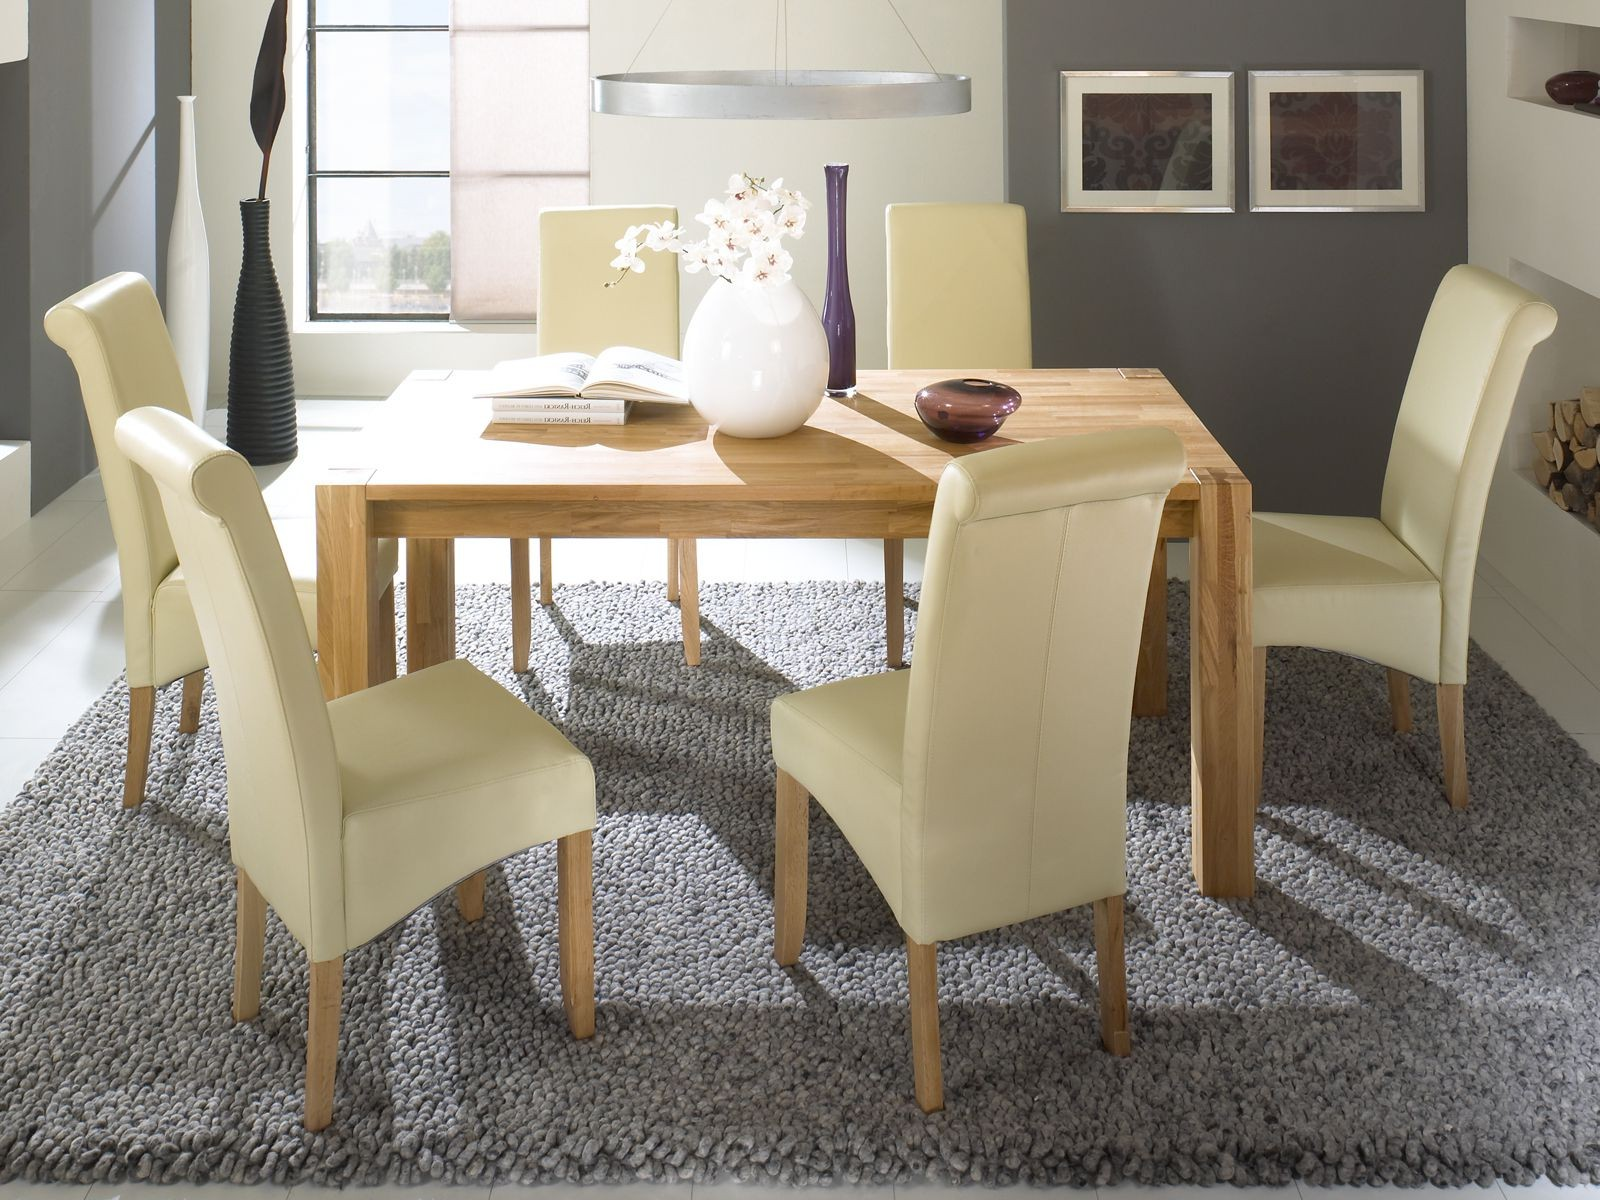 30 beau chaise salle a manger cuir jdt4 armoires de cuisine for Chaise de salle a manger cuir pour deco cuisine